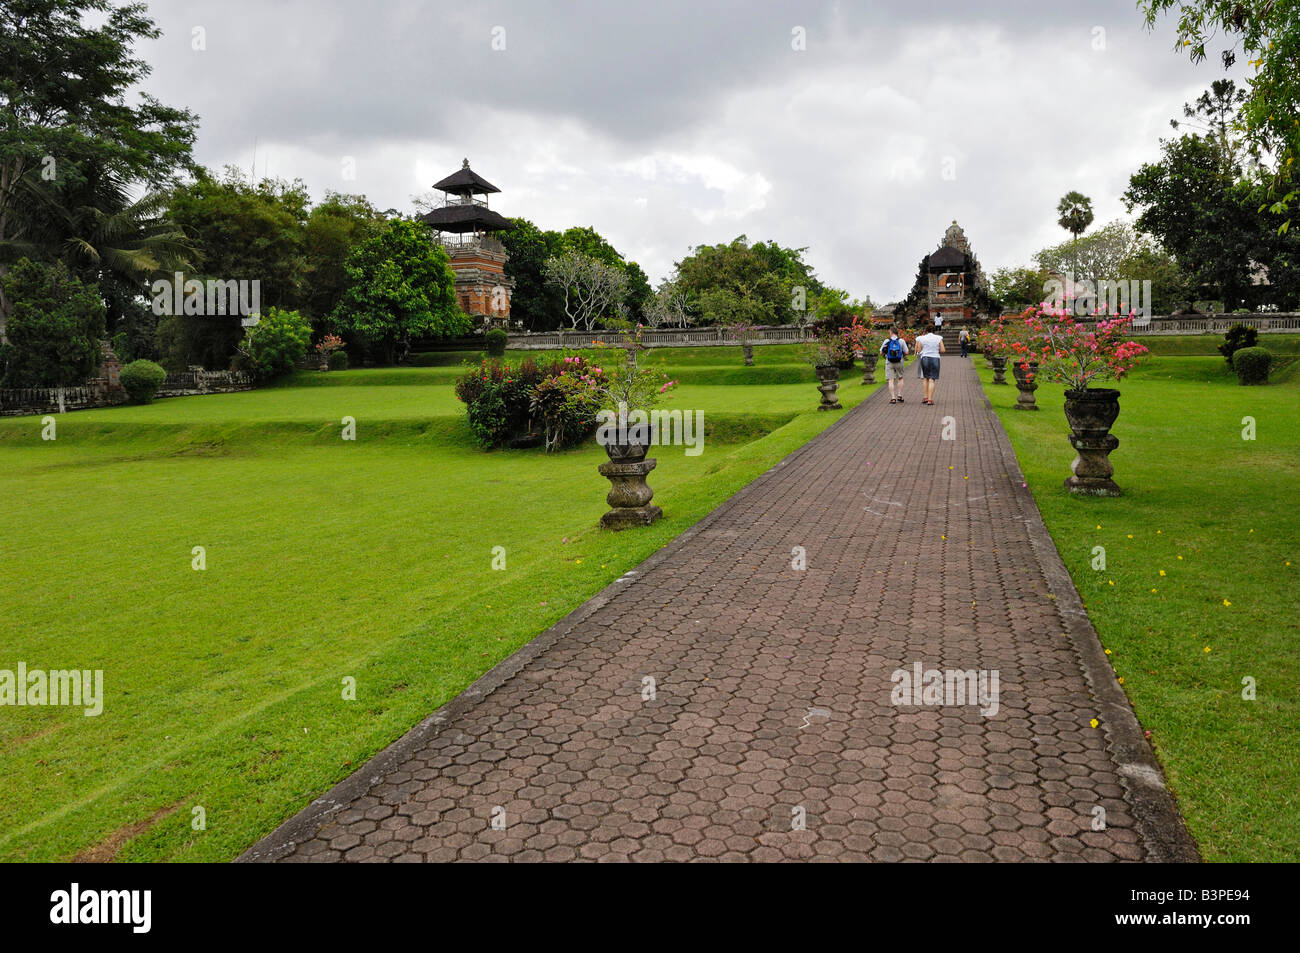 Pura Taman Ayun Tempel und Kulkul Tower in Mengwi, Bali, Indonesien Stockbild